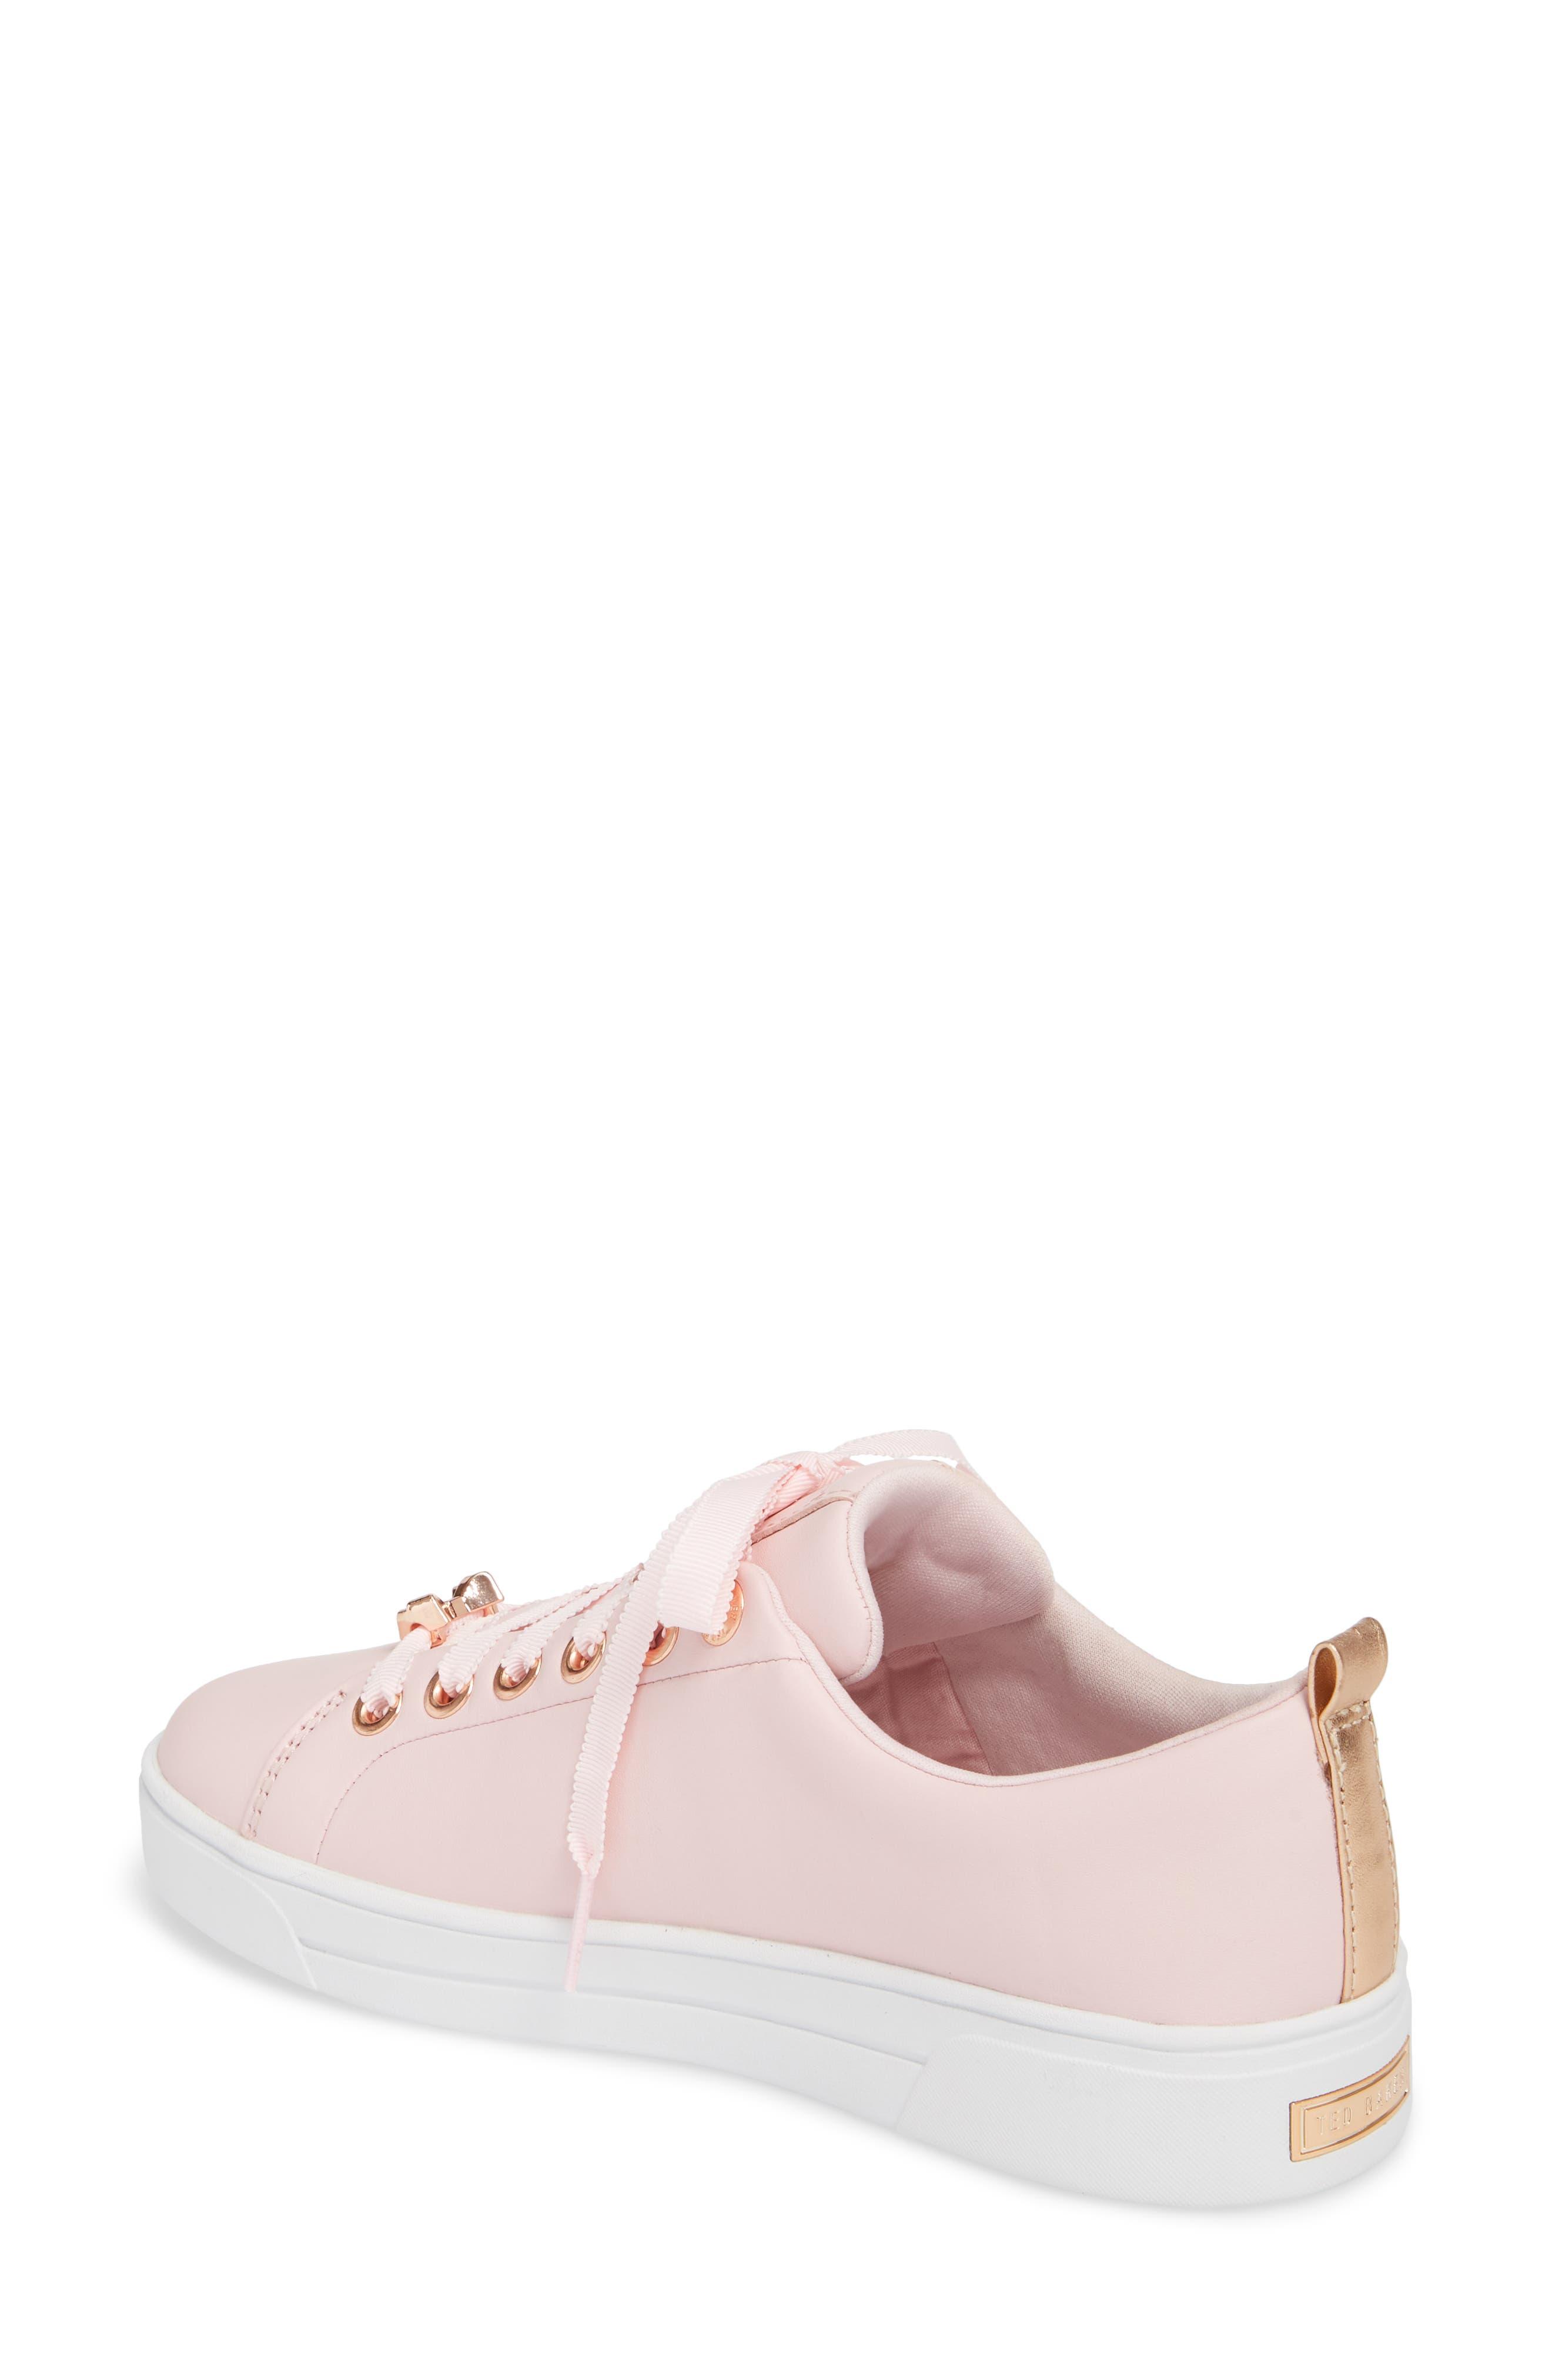 Kelleie Embroidered Sneaker,                             Alternate thumbnail 2, color,                             Mink Pink Leather